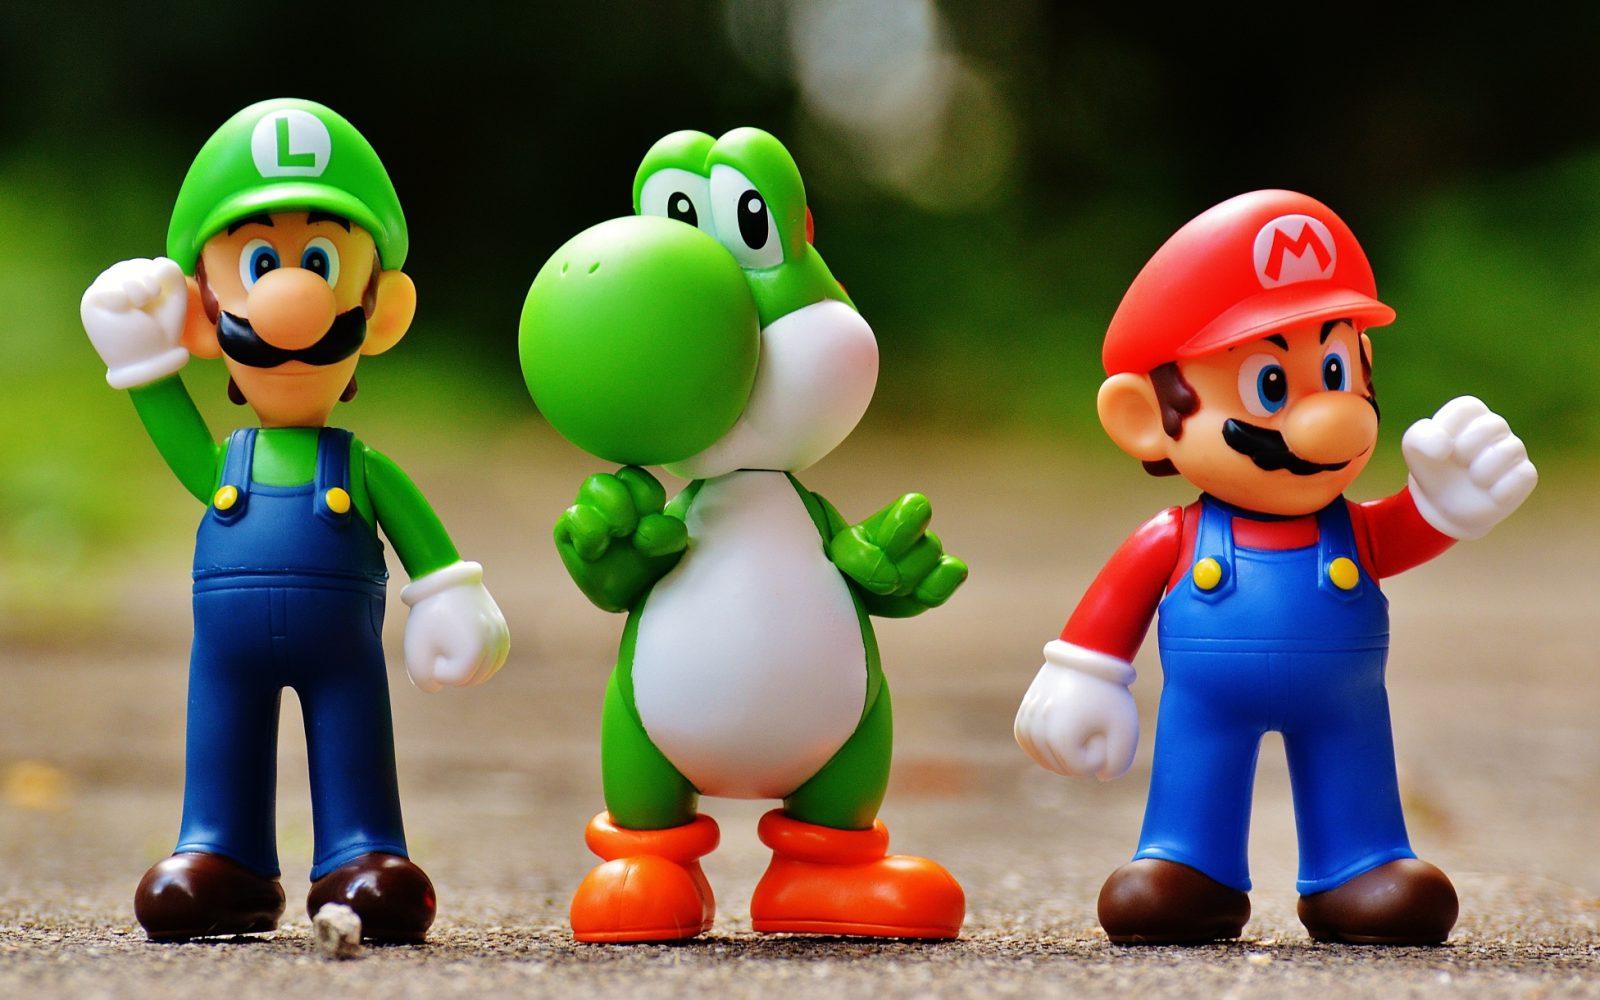 Super Mario - Luigi - Yoshi - Gaming - Videogiochi (Foto Pixabay) Imc